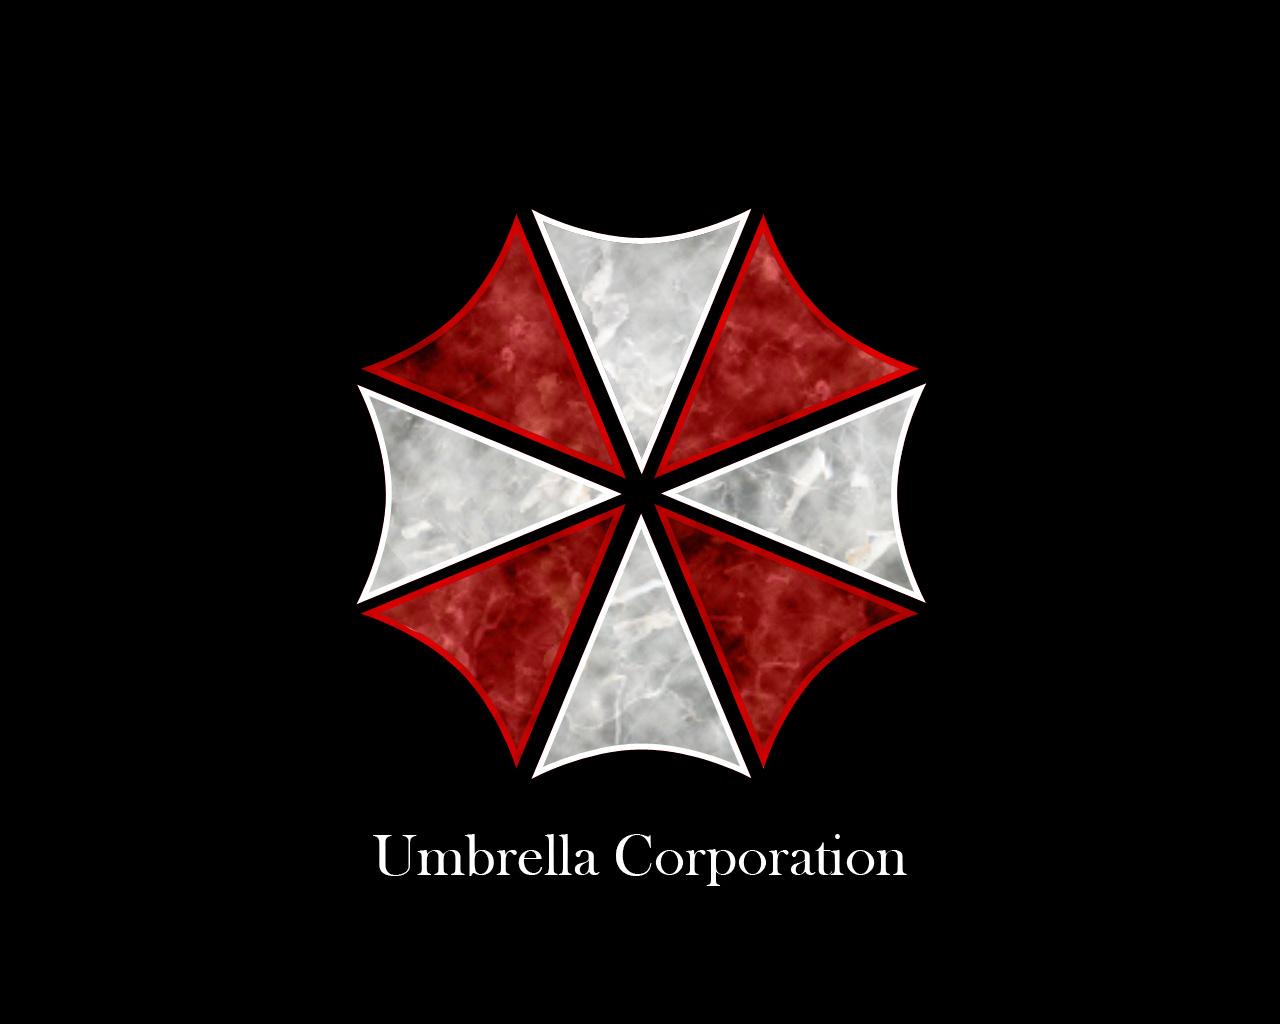 Umbrella Corporation Logo Photoshop Tutorials Designstacks